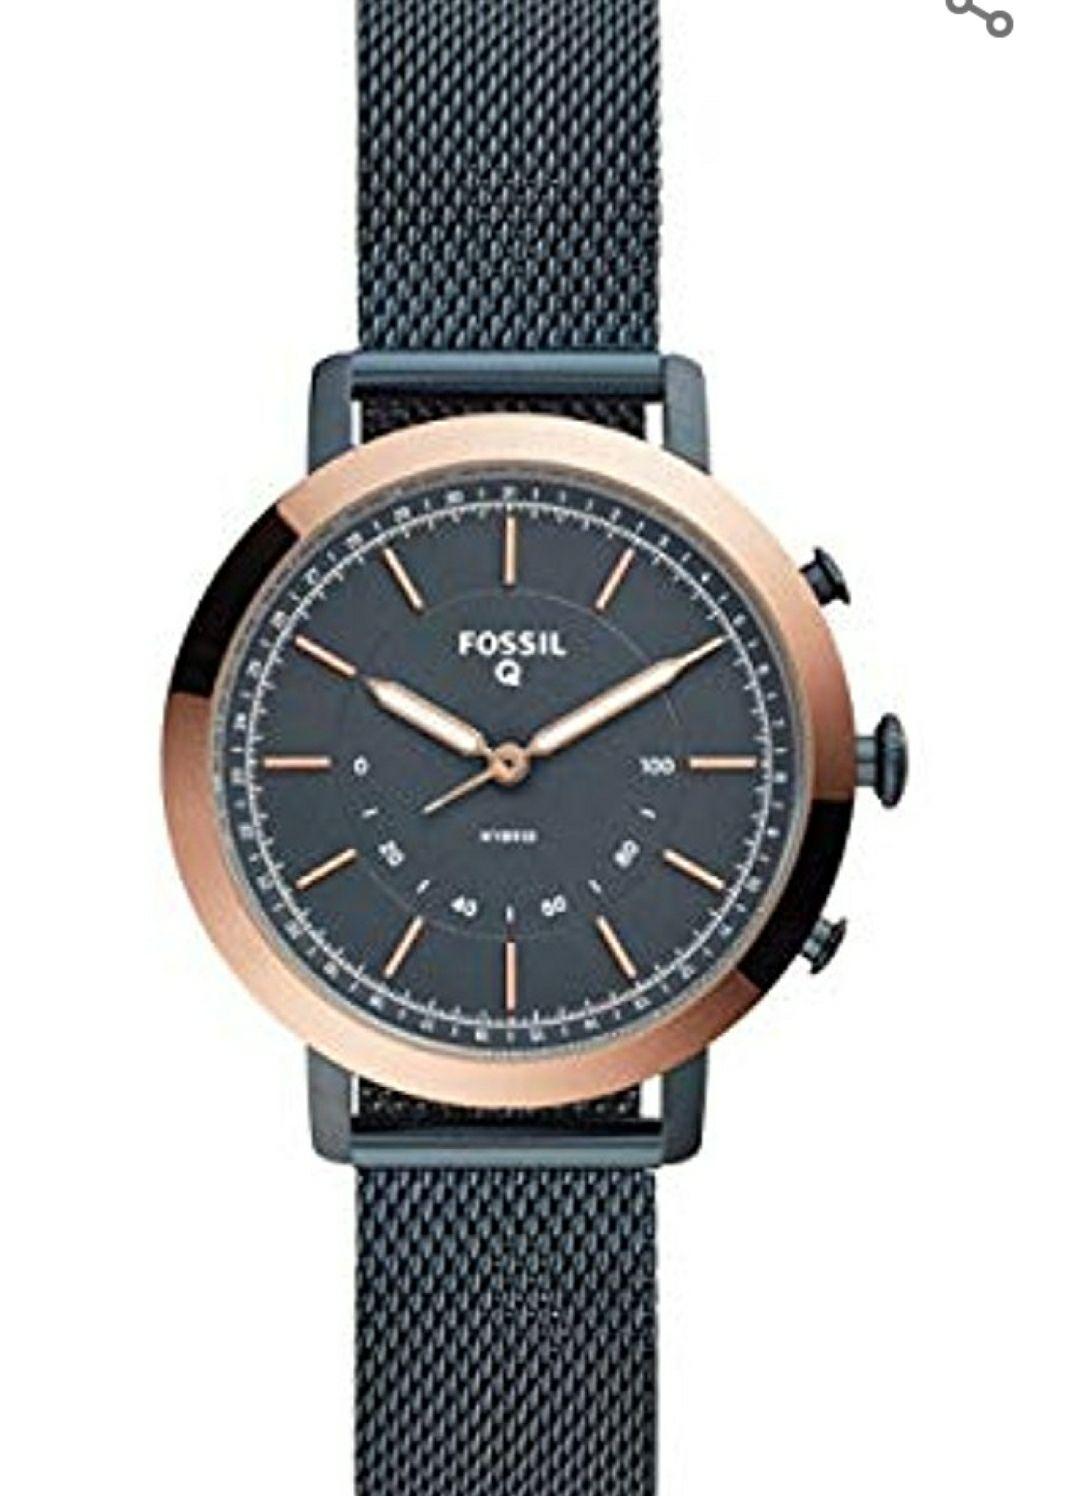 FOSSIL Damen Hybrid Analog Quarz Smart Watch Armbanduhr mit Edelstahl Armband FTW5031